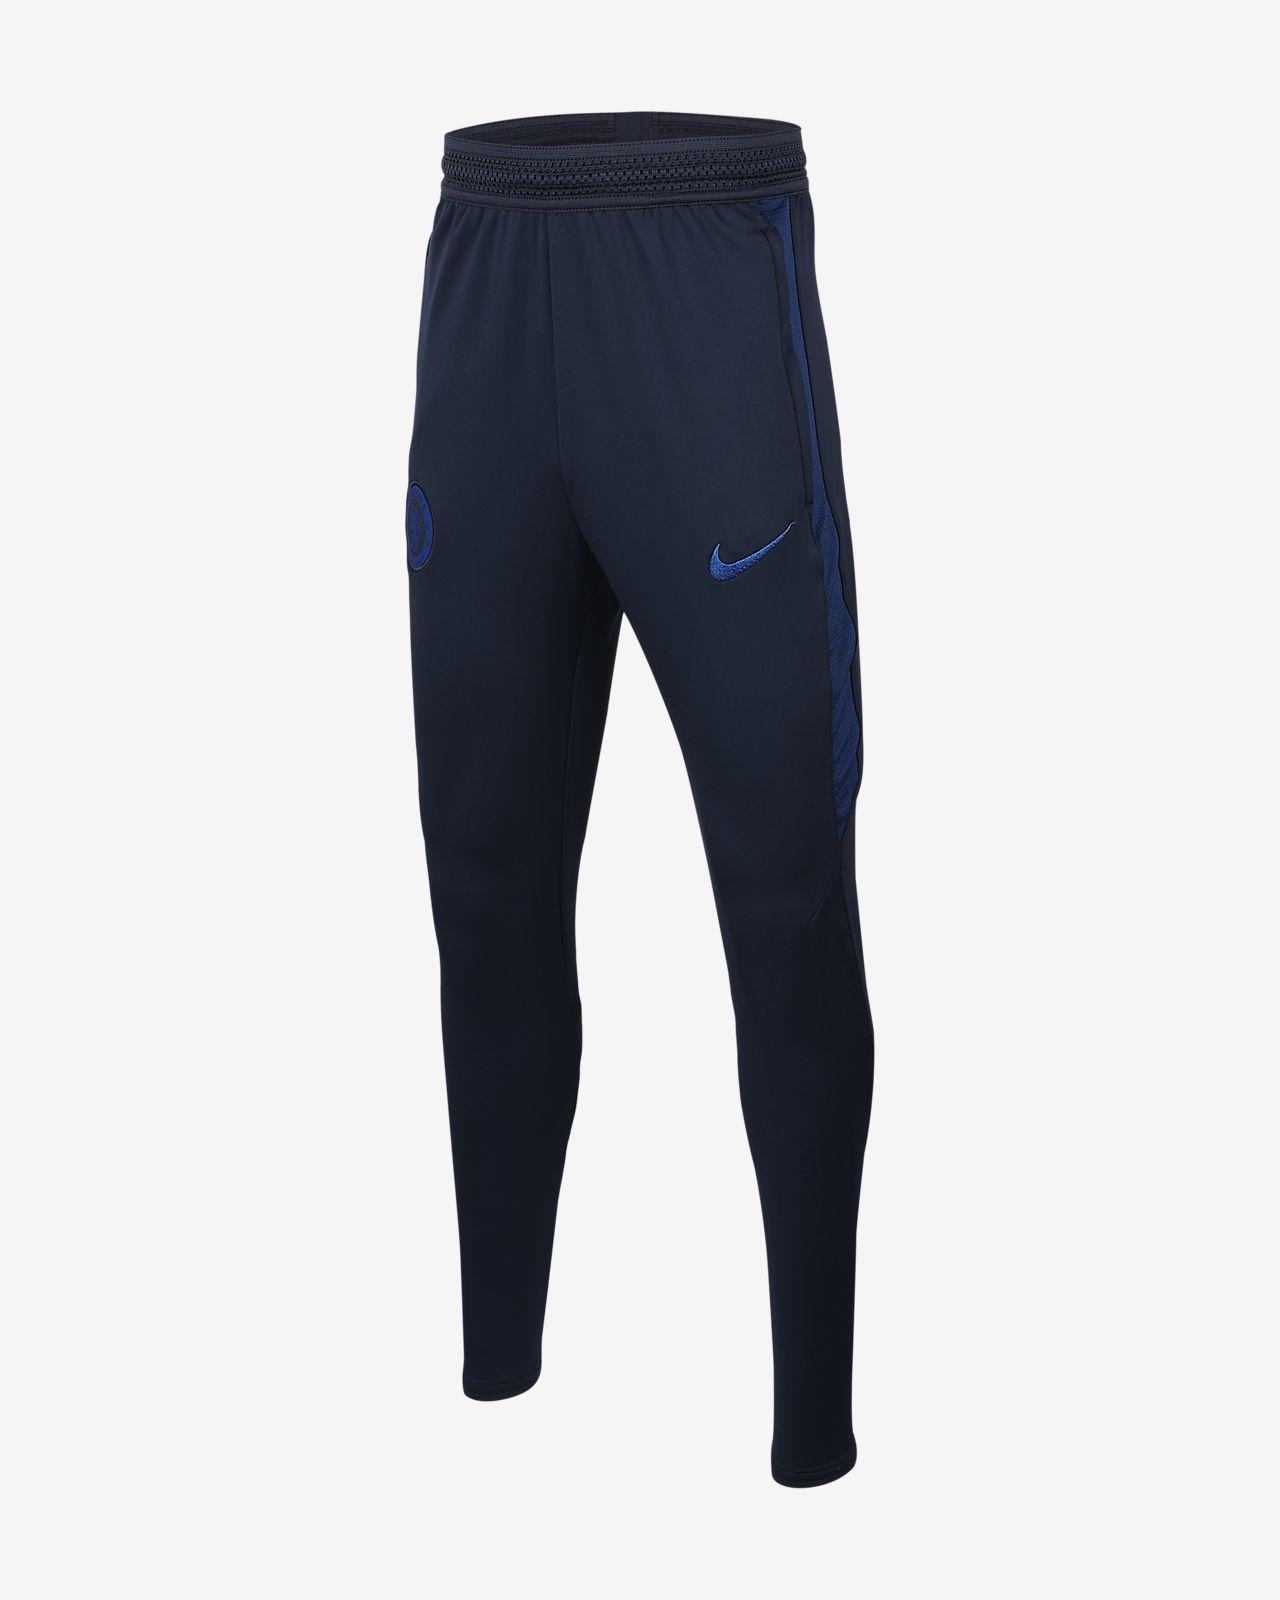 Nike Dri-FIT Chelsea FC Strike futballnadrág gyerekeknek